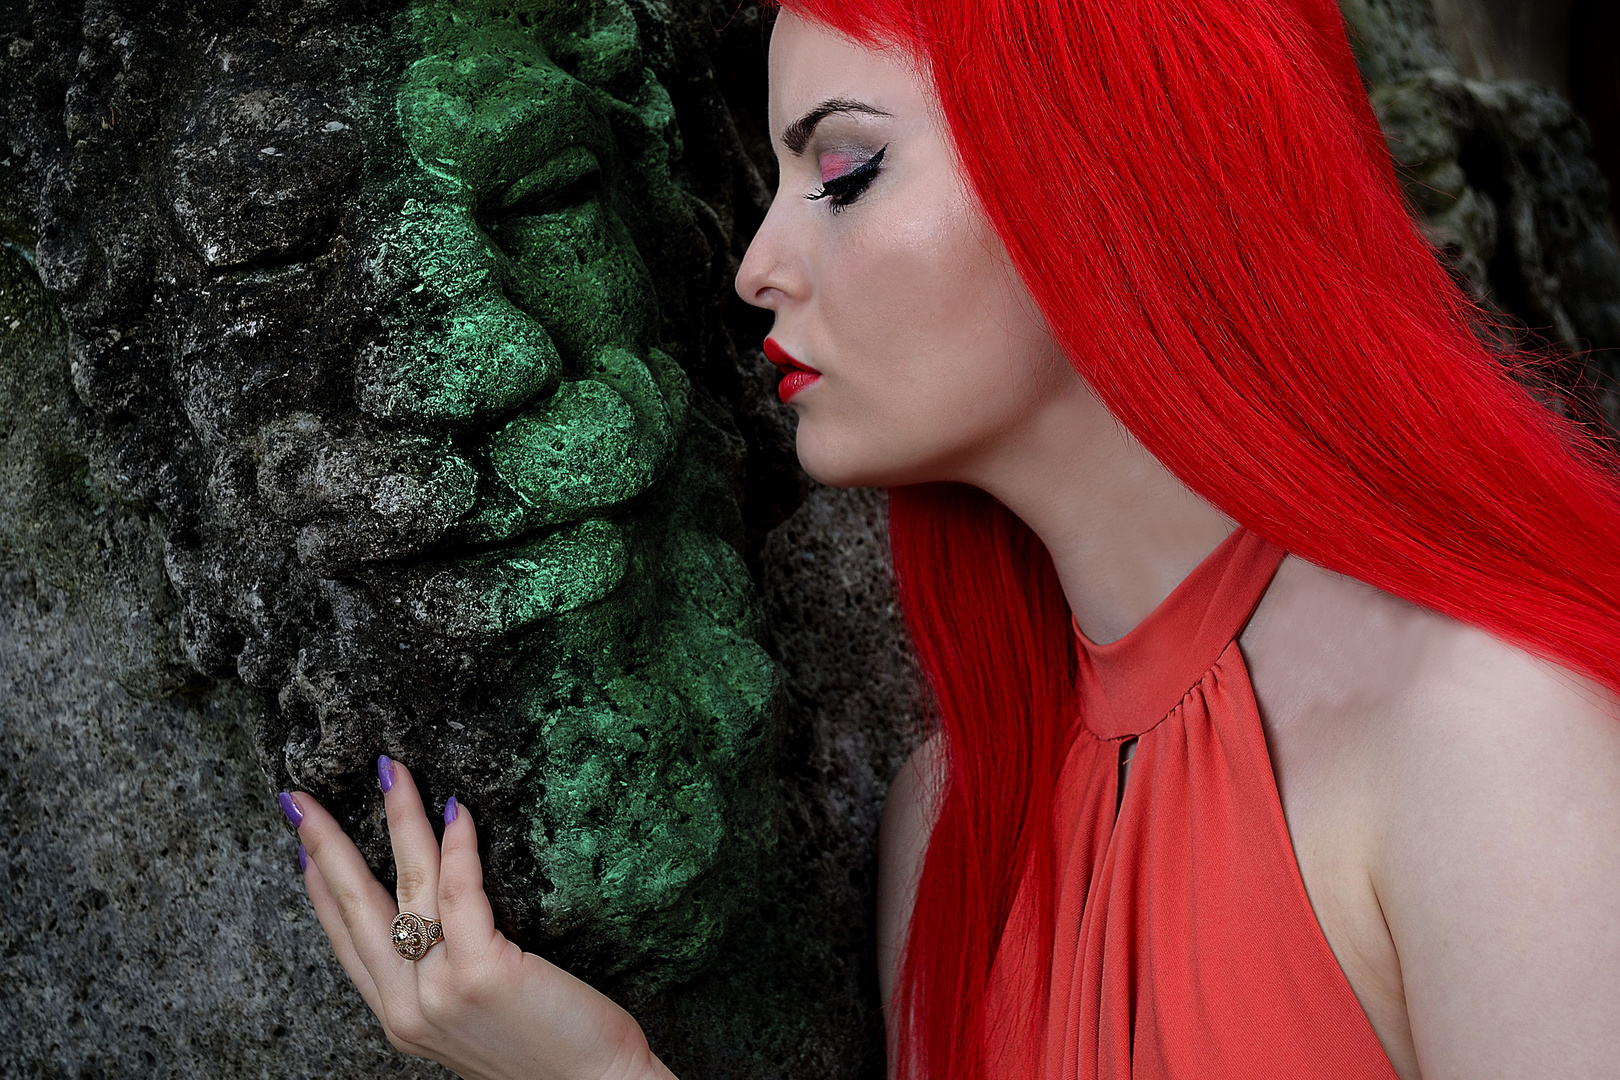 Kuss in rot-grün